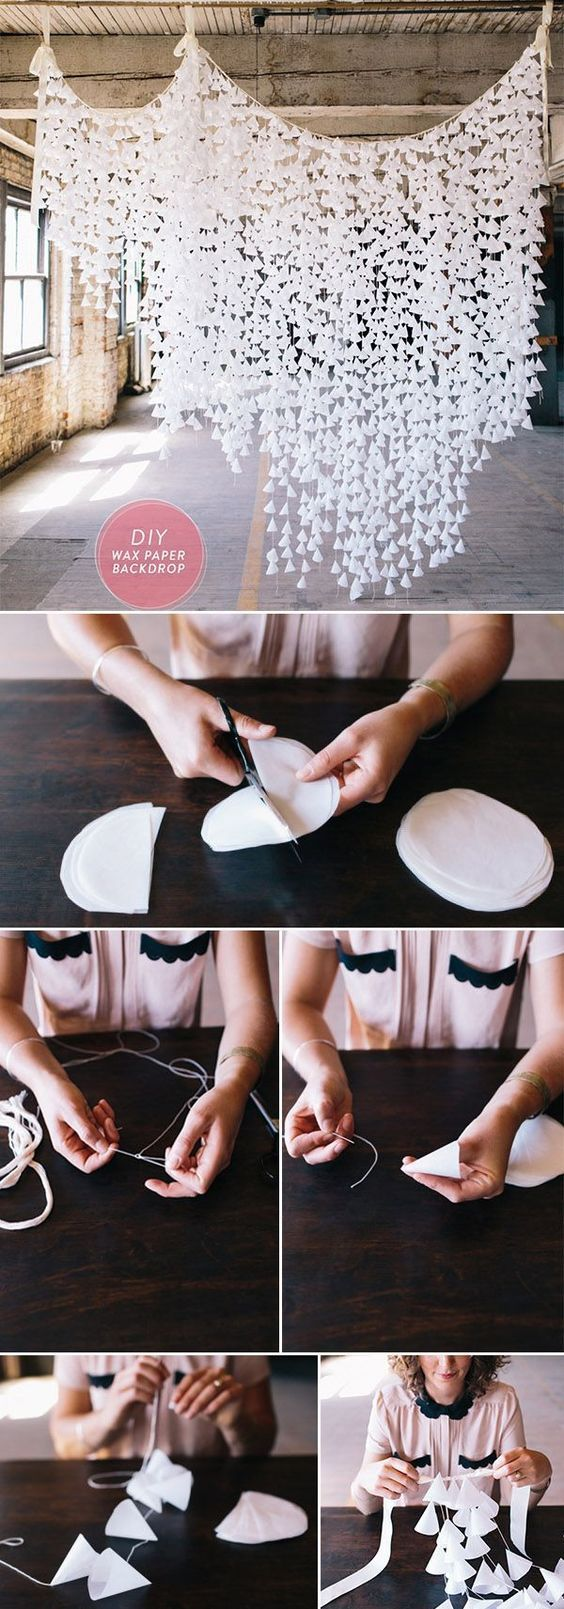 10 Wedding Ideas On A Budget  SHESAID United States